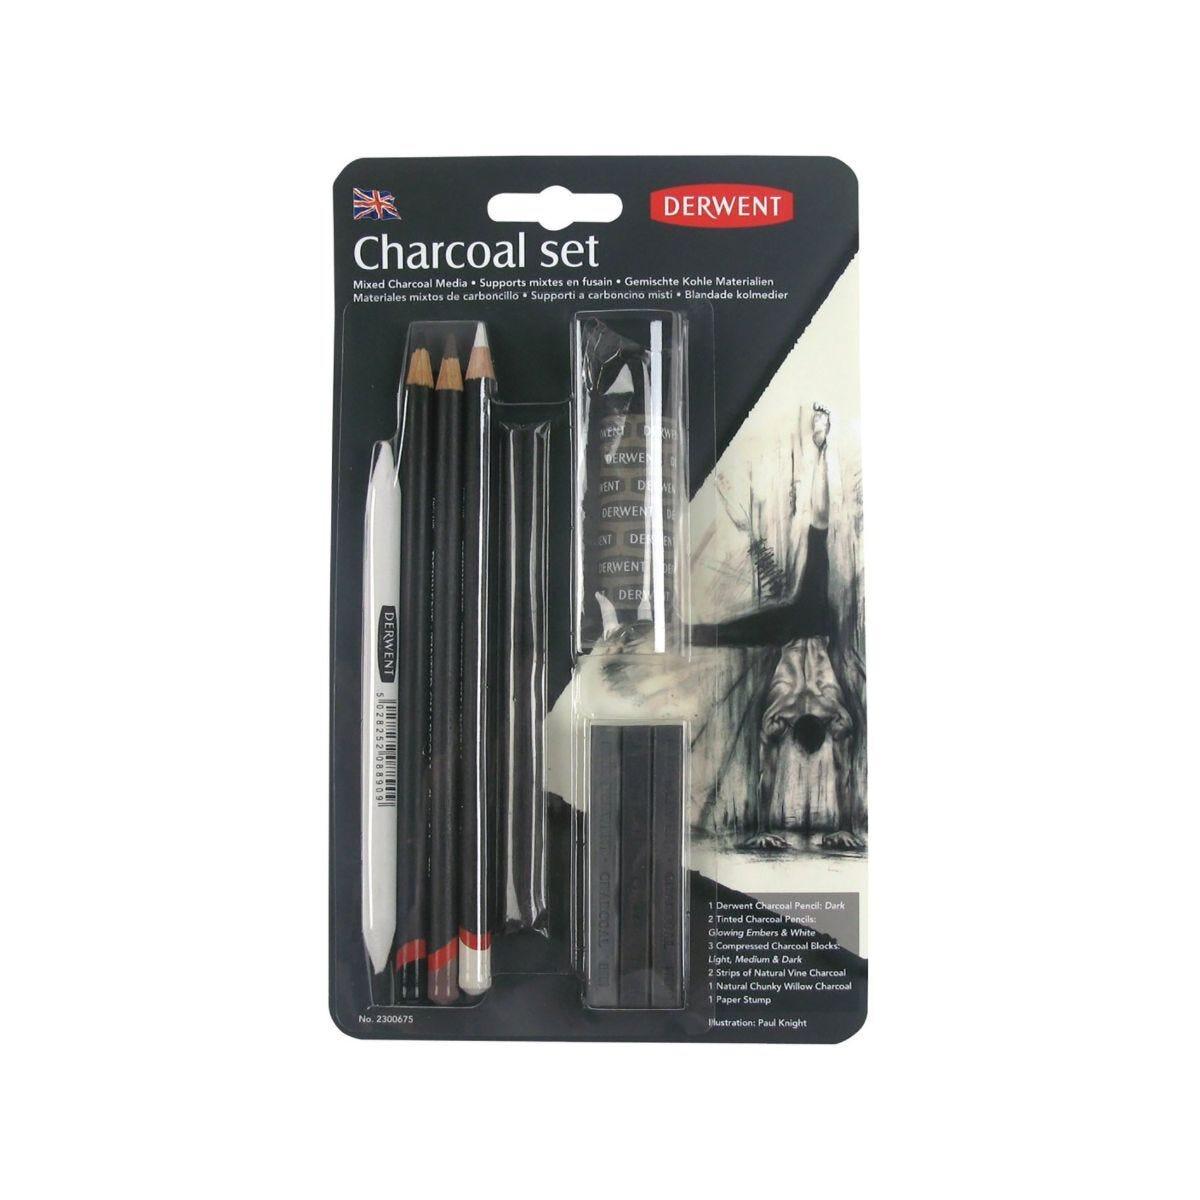 Derwent Charcoal Set